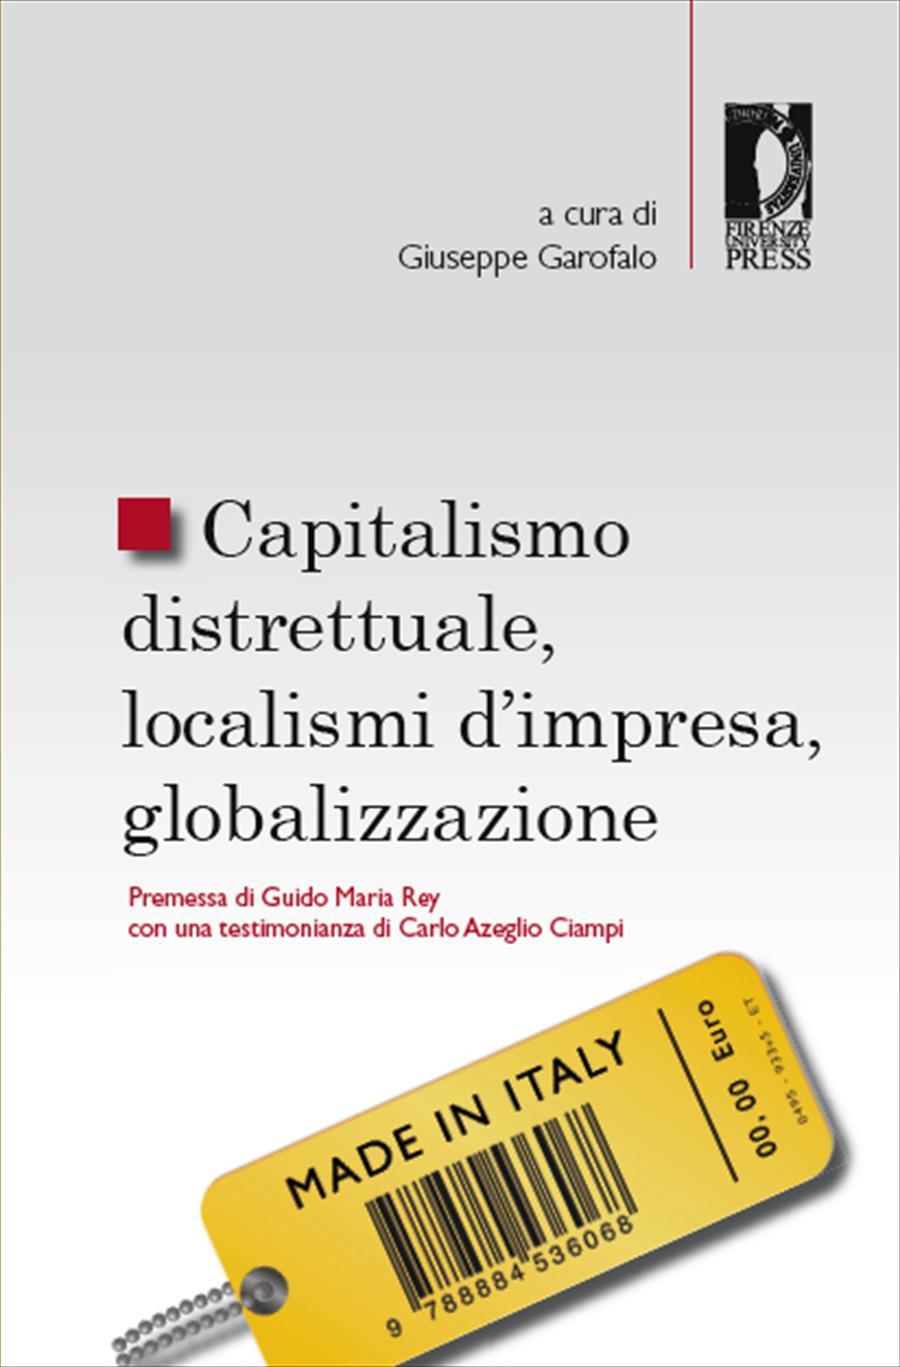 Capitalismo distrettuale, localismi d'impresa, globalizzazione